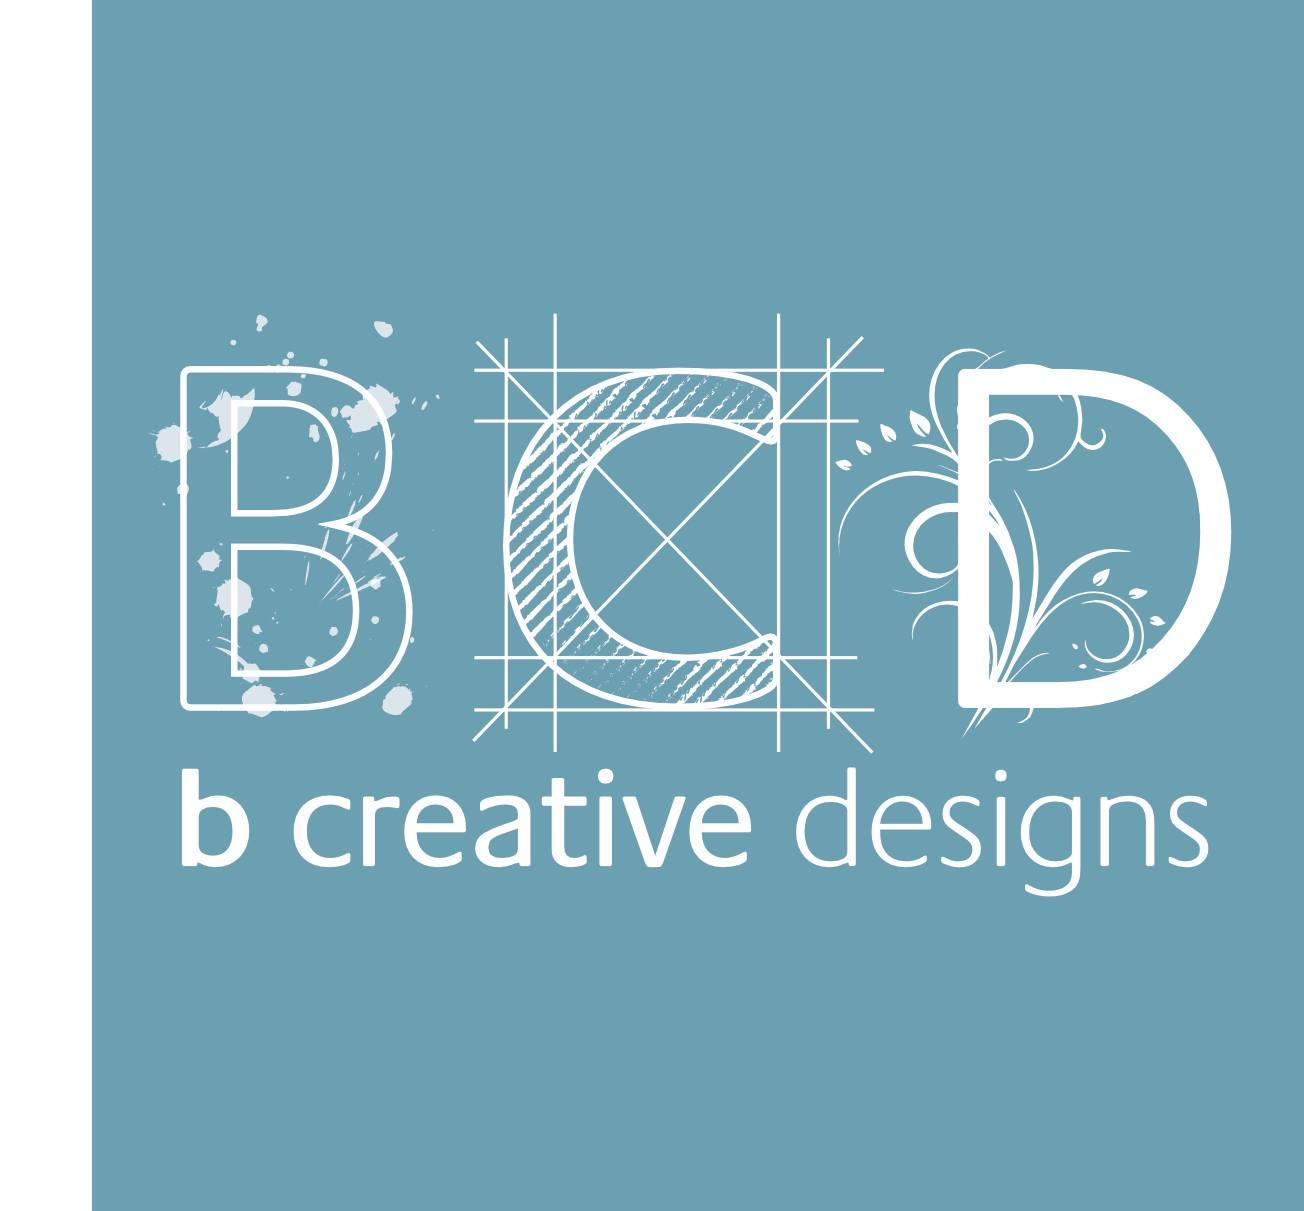 B creative designs logo